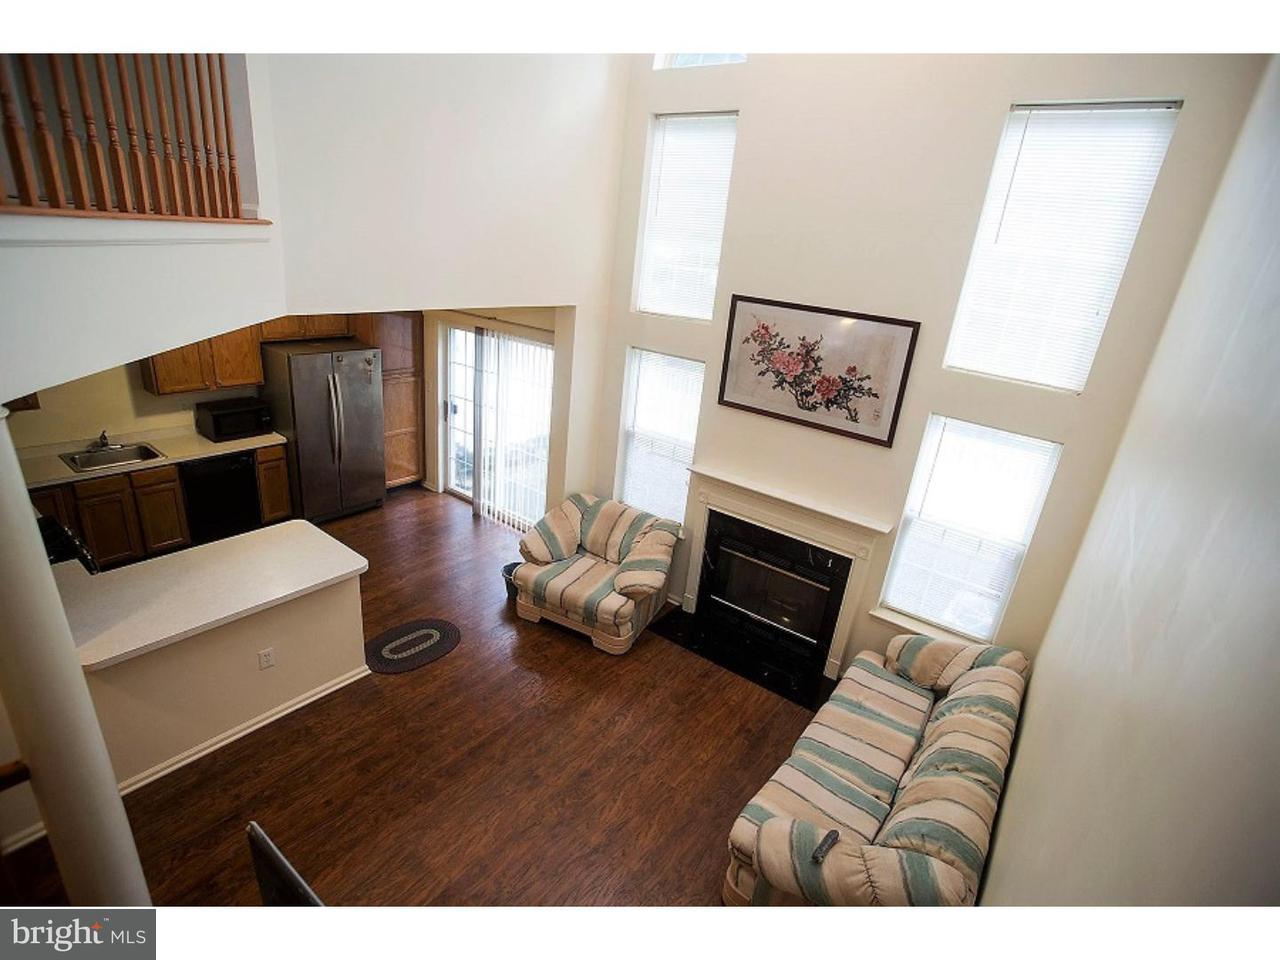 Condominium for Sale at 8 HILTON Court Pennington, New Jersey 08534 United StatesMunicipality: Hopewell Township